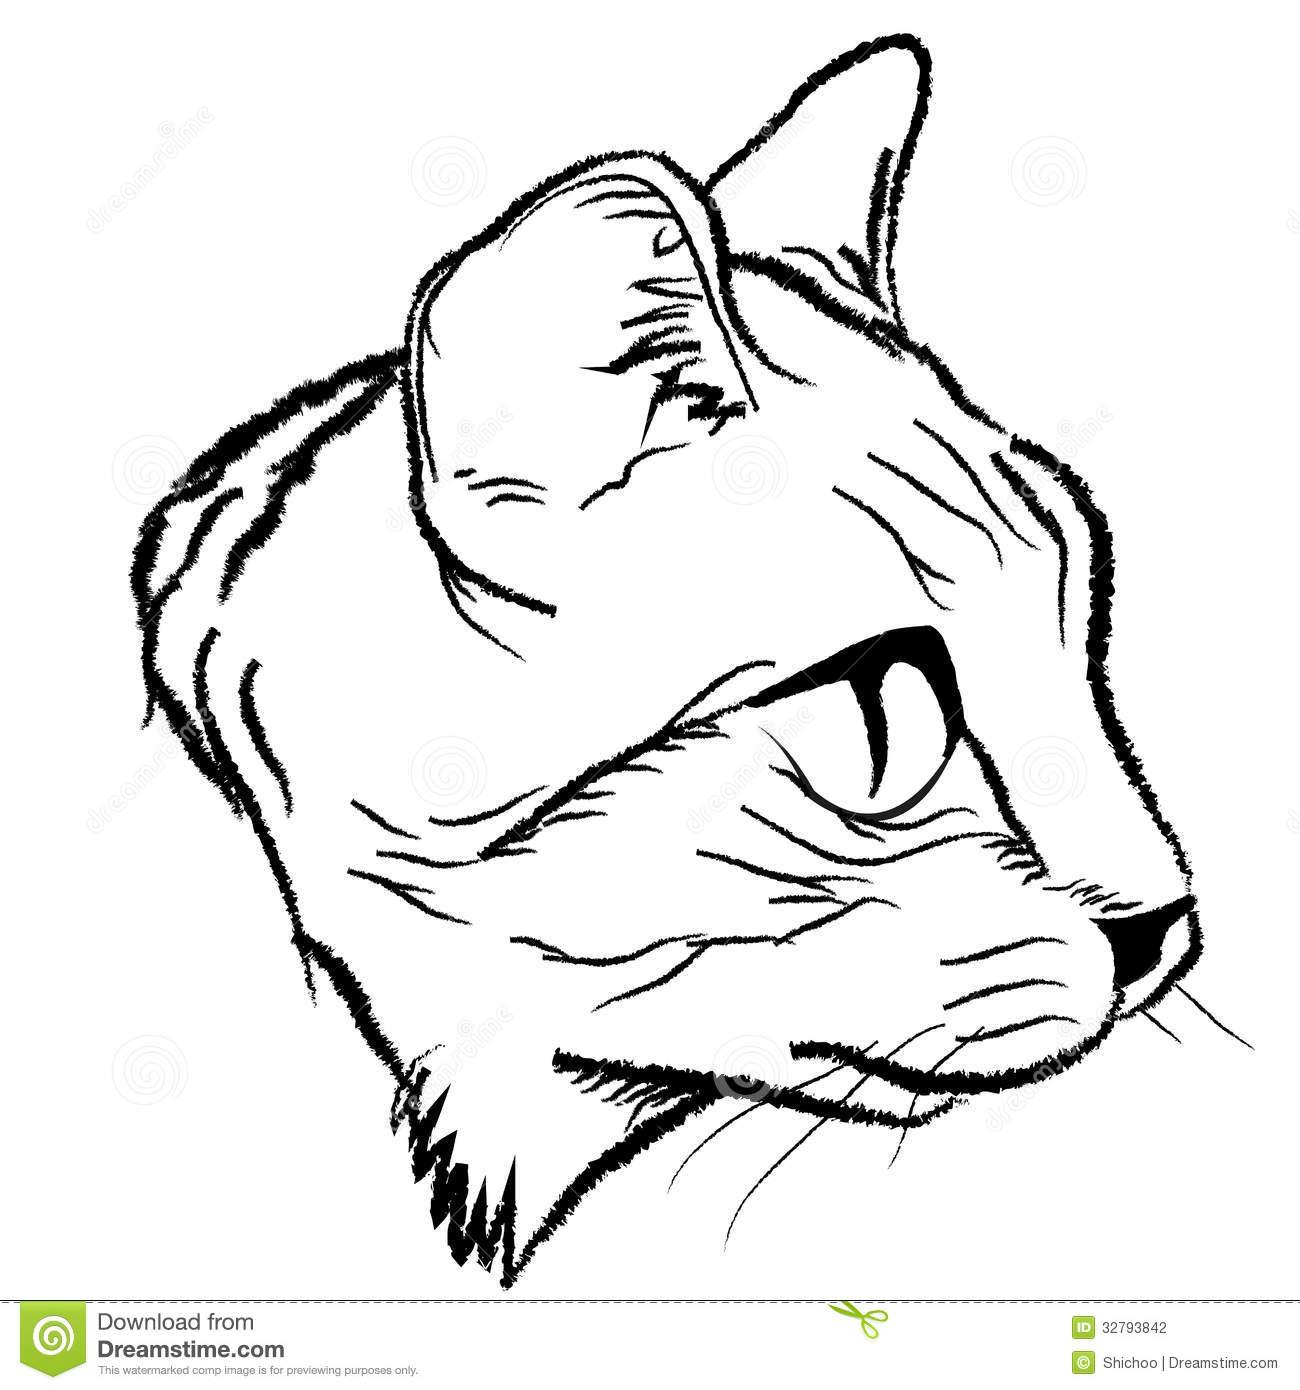 1300x1390 Cat Face Illustration Cat Face Draw Design By Illustration. ~i